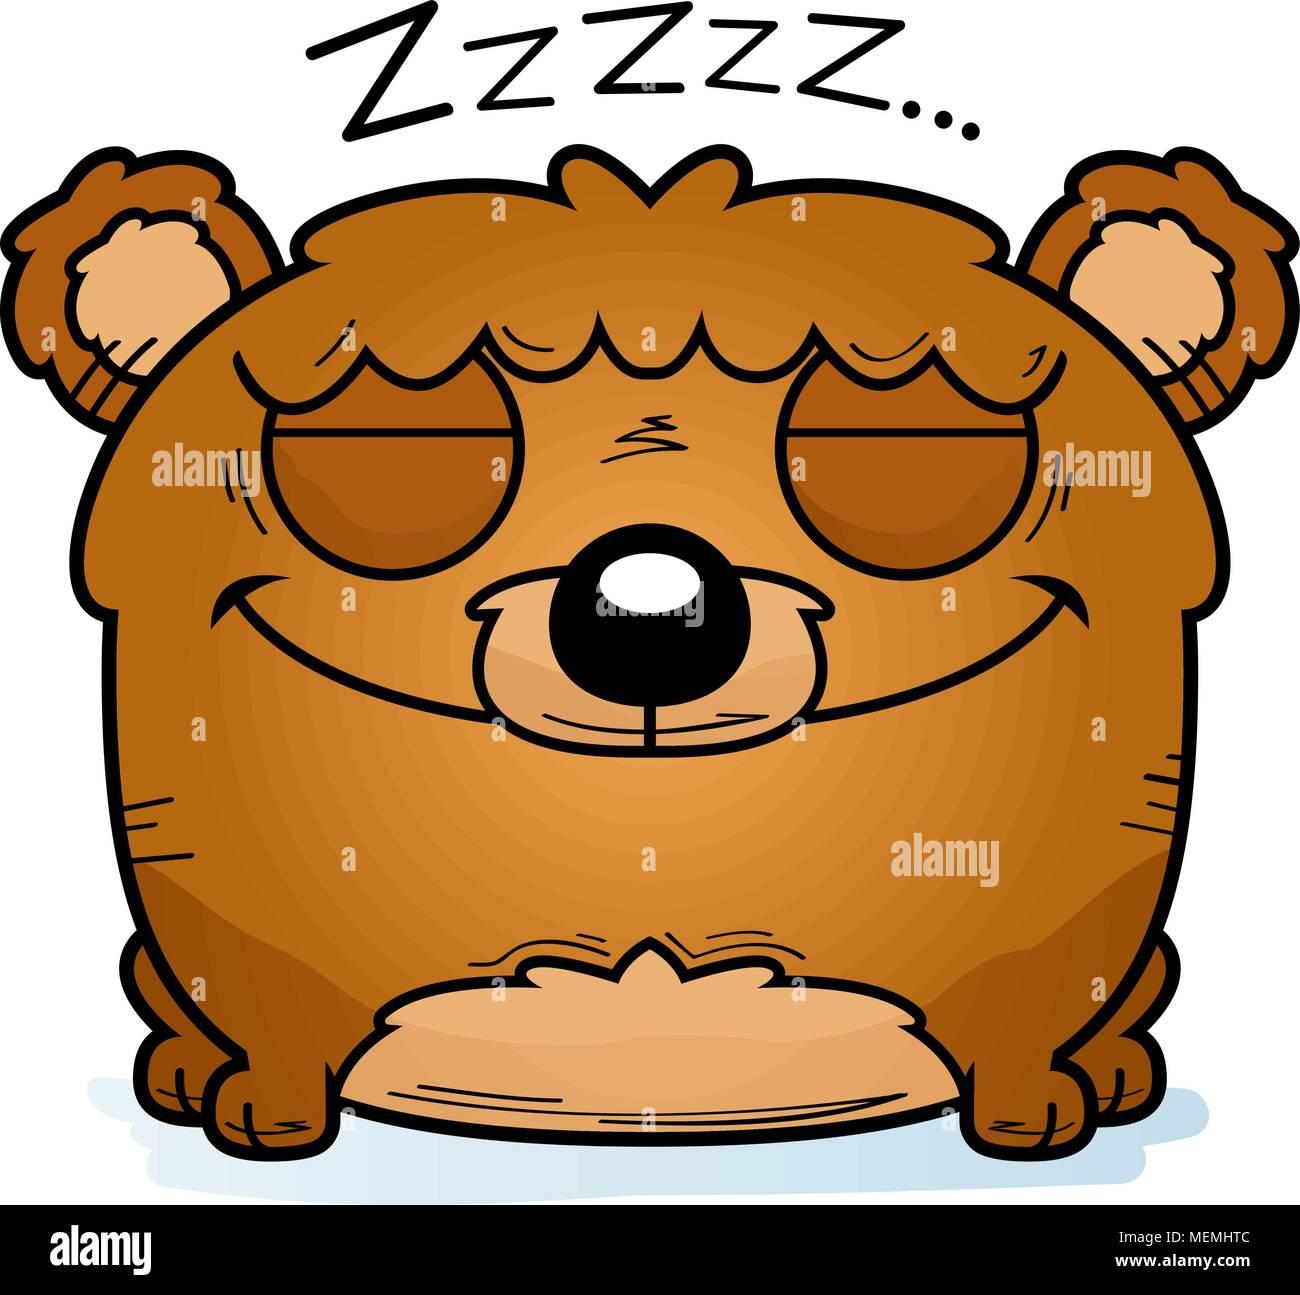 A cartoon illustration of a bear cub hibernating. - Stock Image